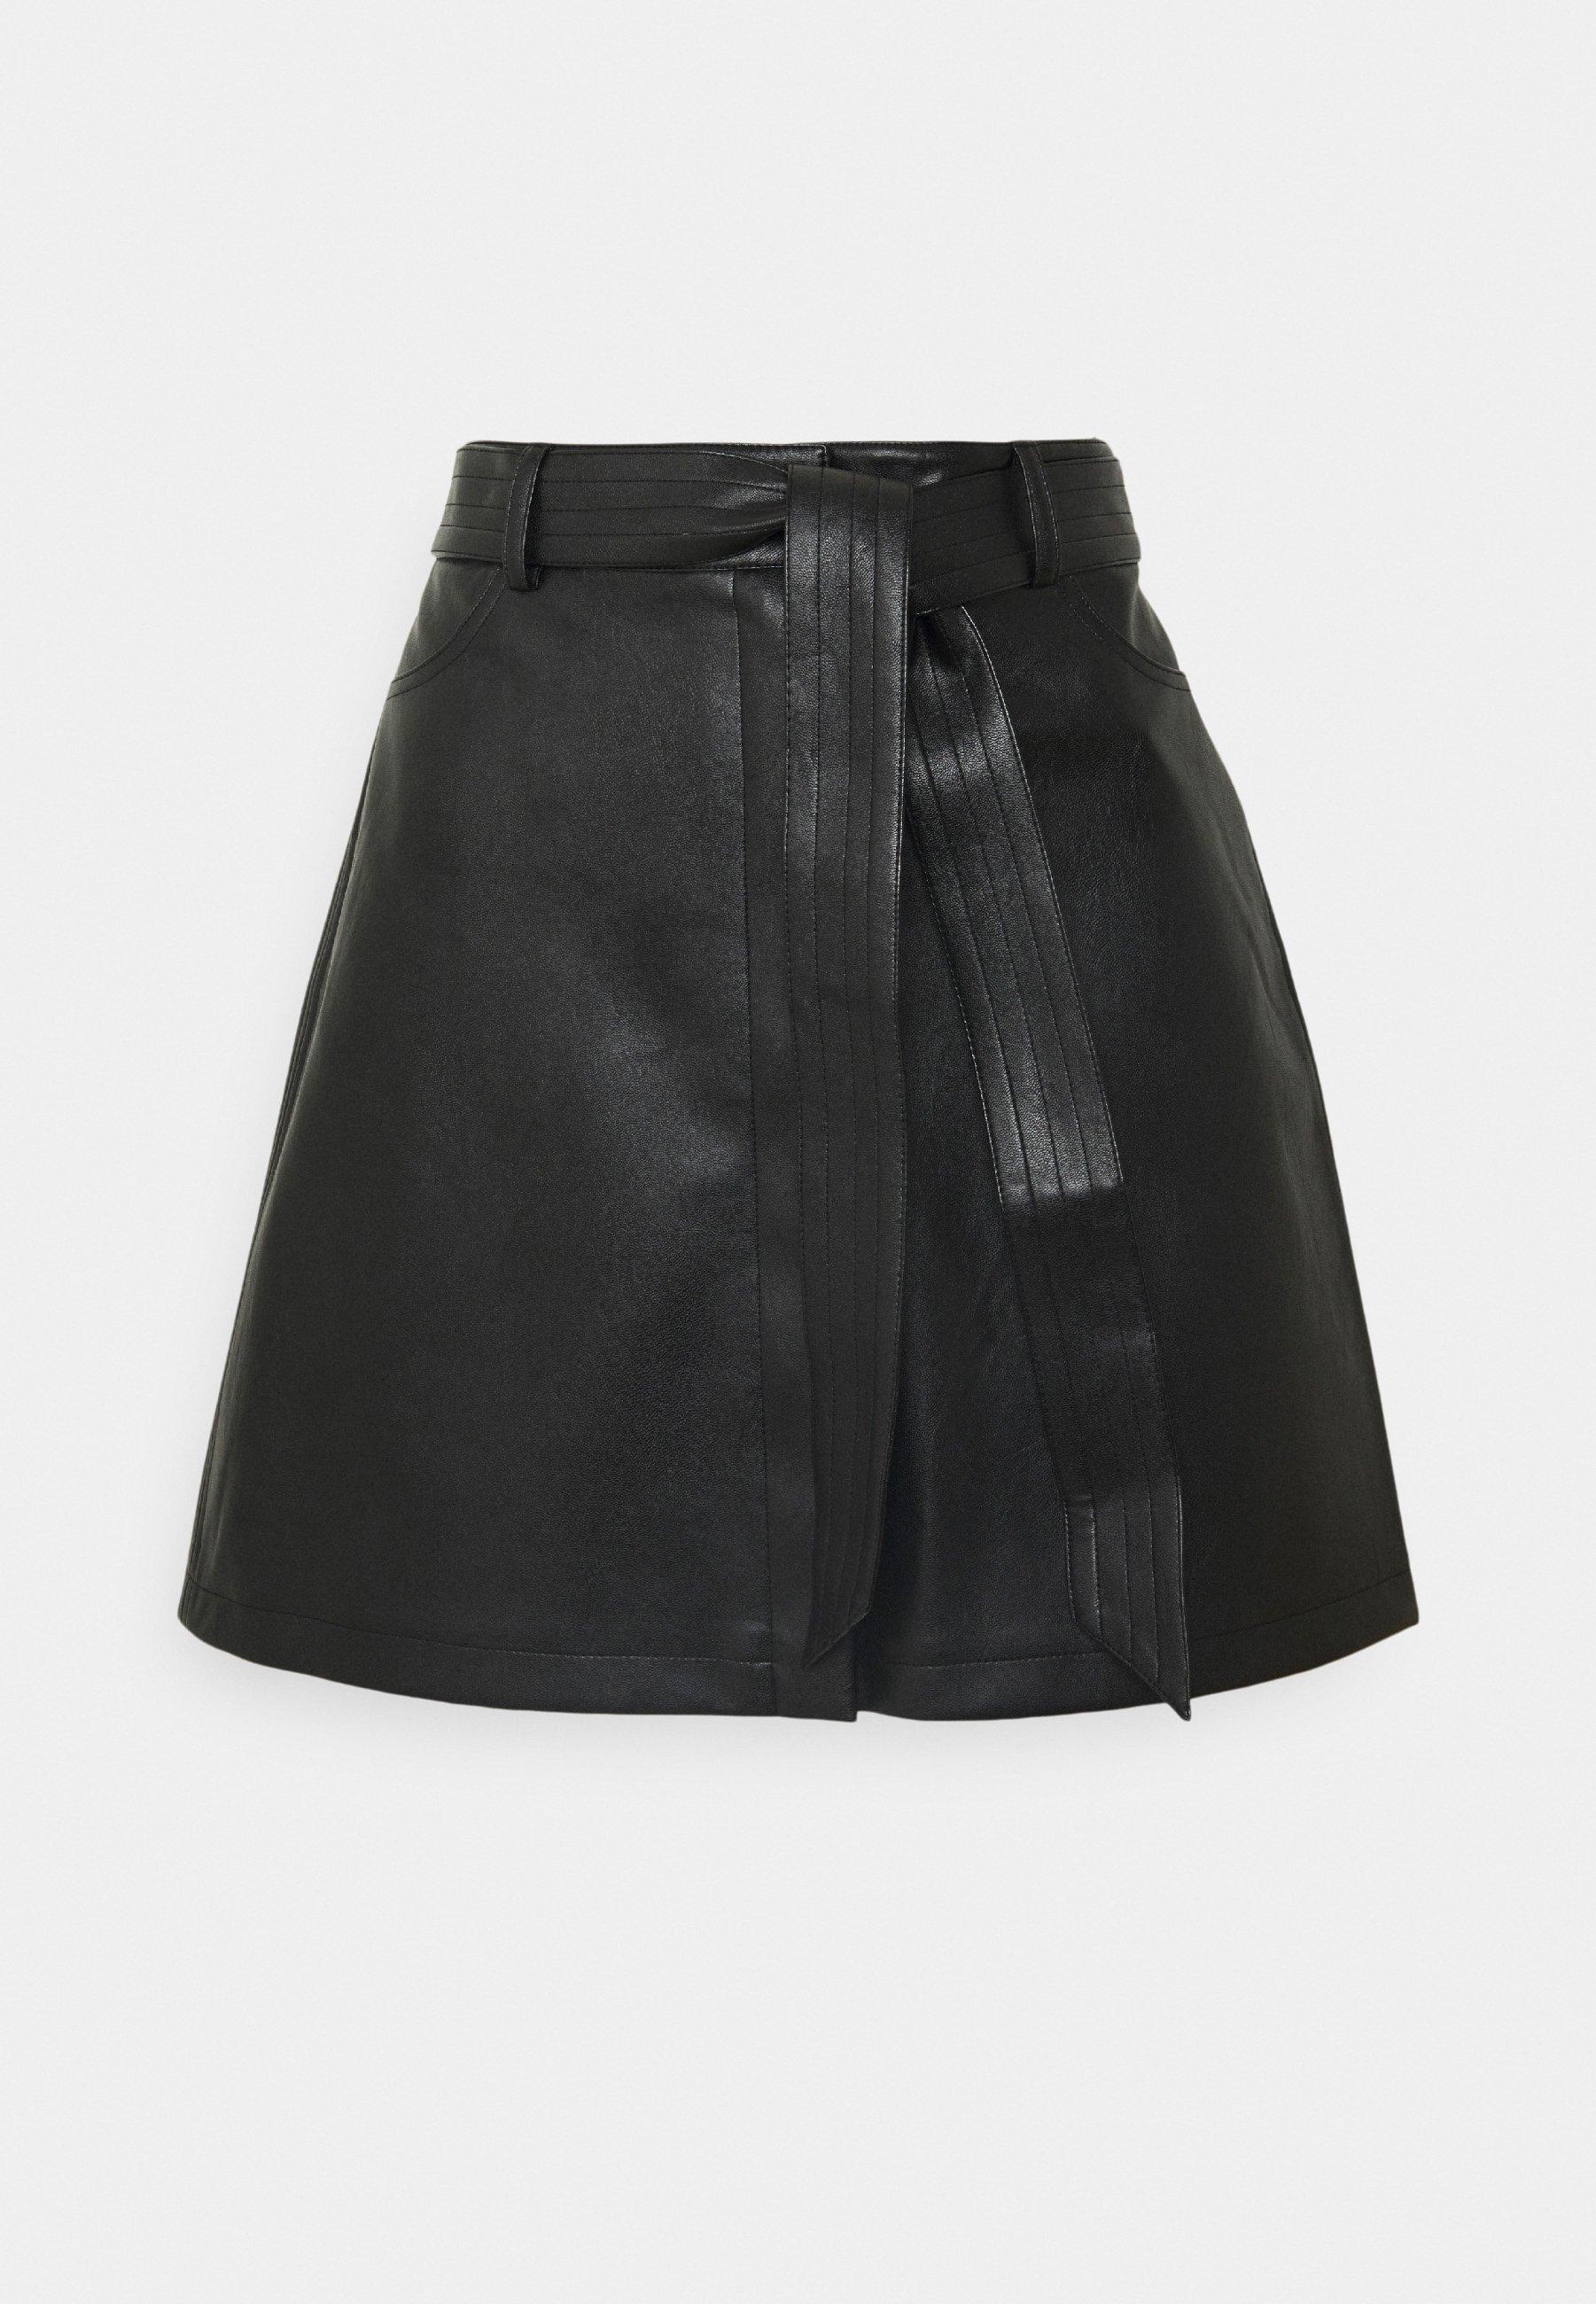 Femme BELTED MINI SKIRT - Minijupe